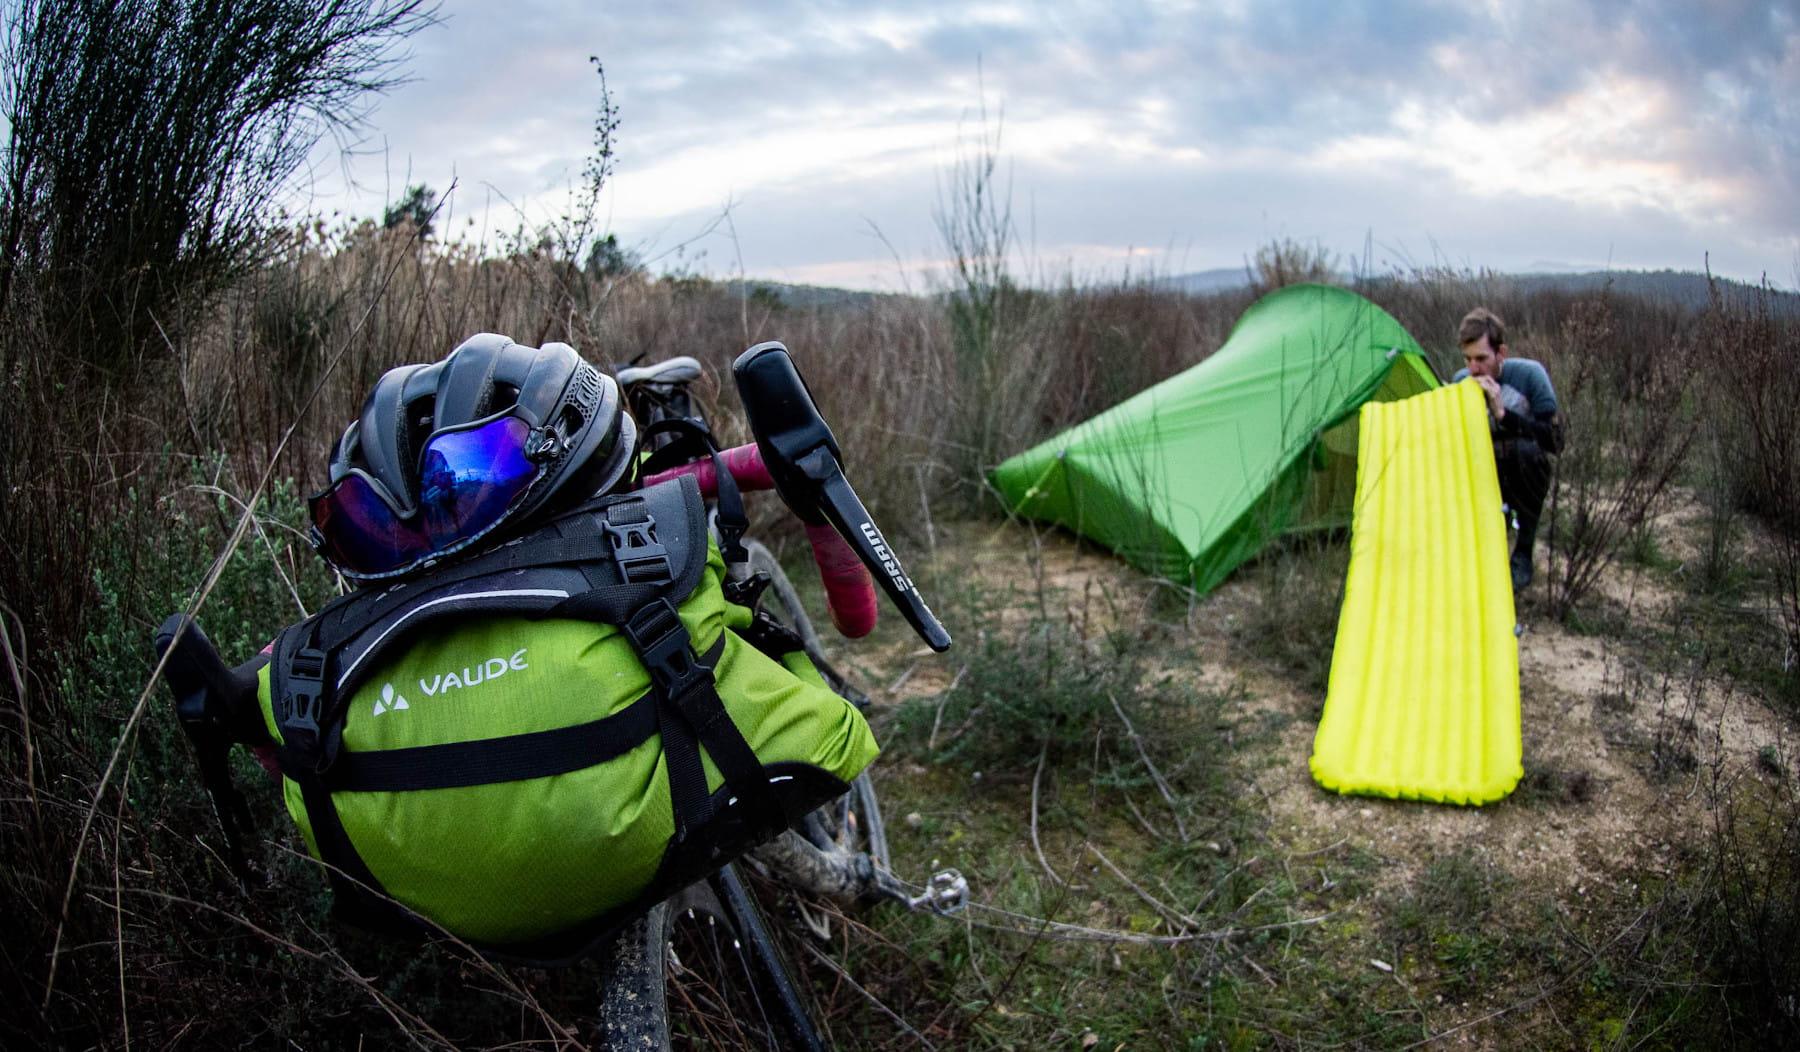 bikepacking-ausruestung-2-1